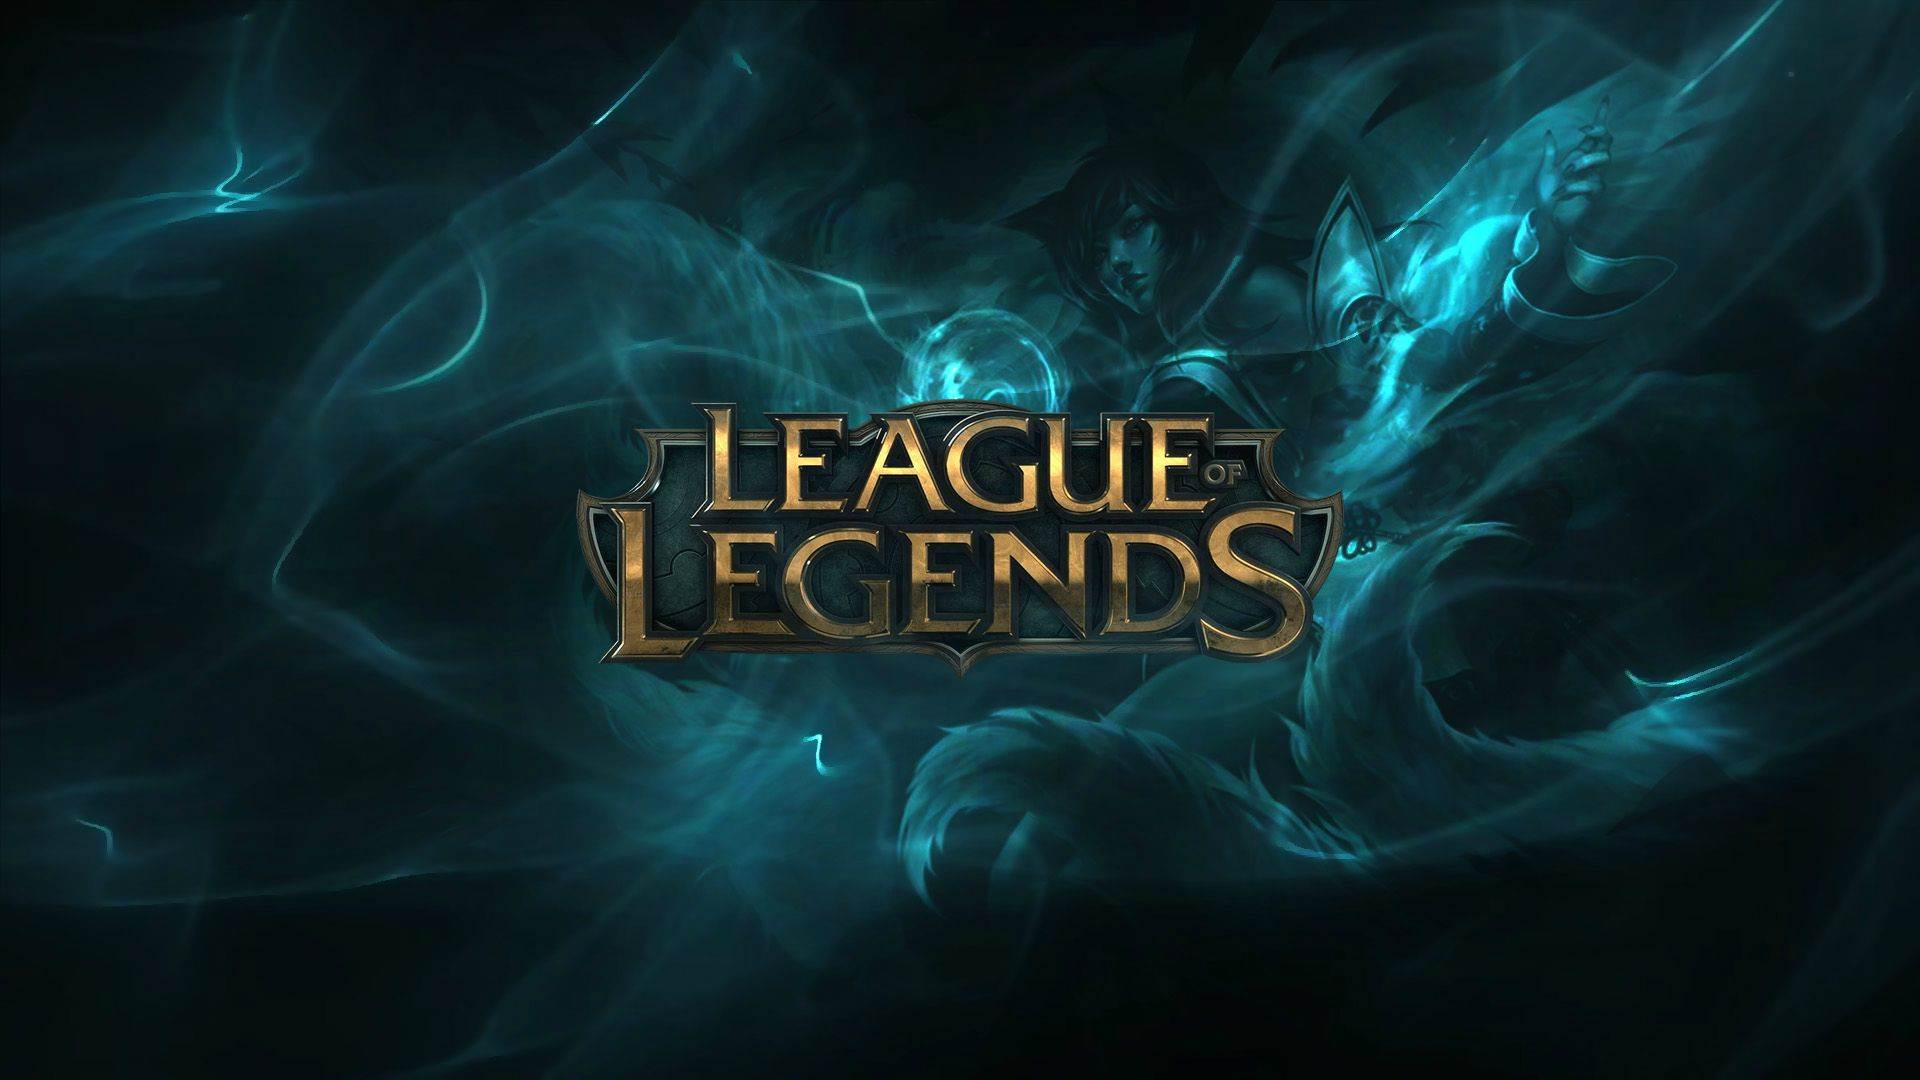 Dev Hd Wallpaper Tapety Na Sezon 6 League Of Legends